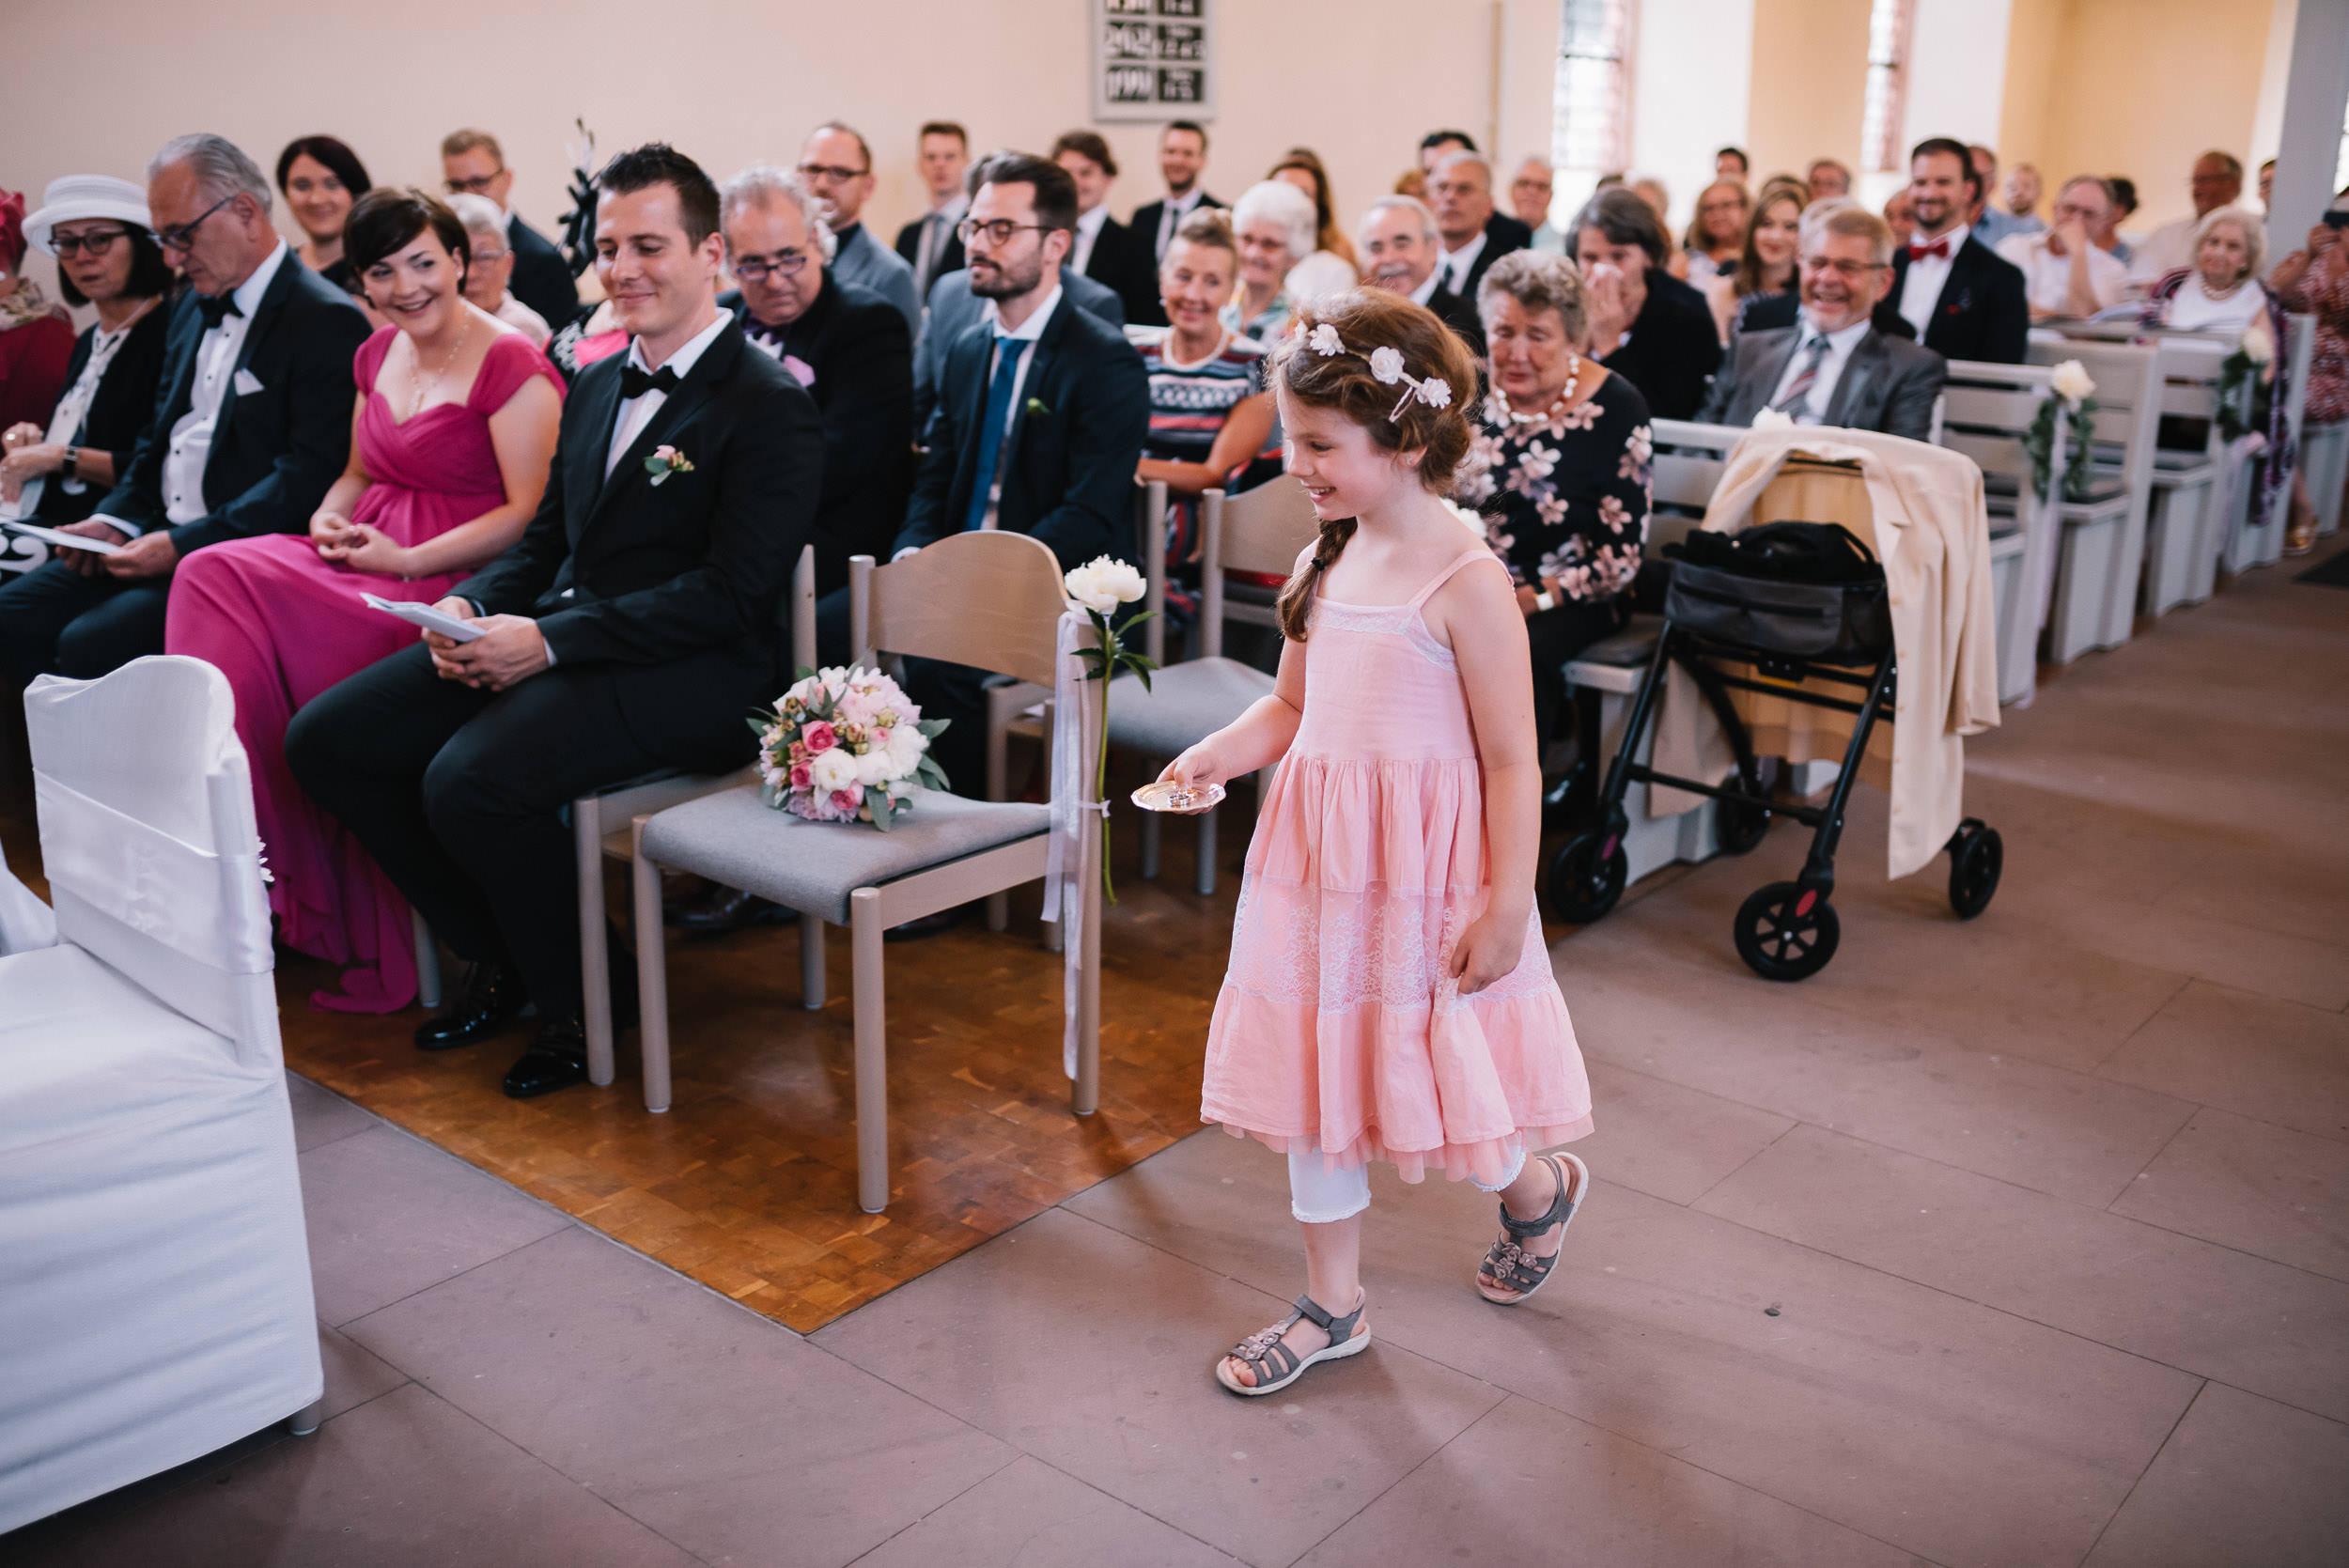 Hochzeit-Julia+Lars-Leimen+Bonsaizentrum-HD-029.jpg